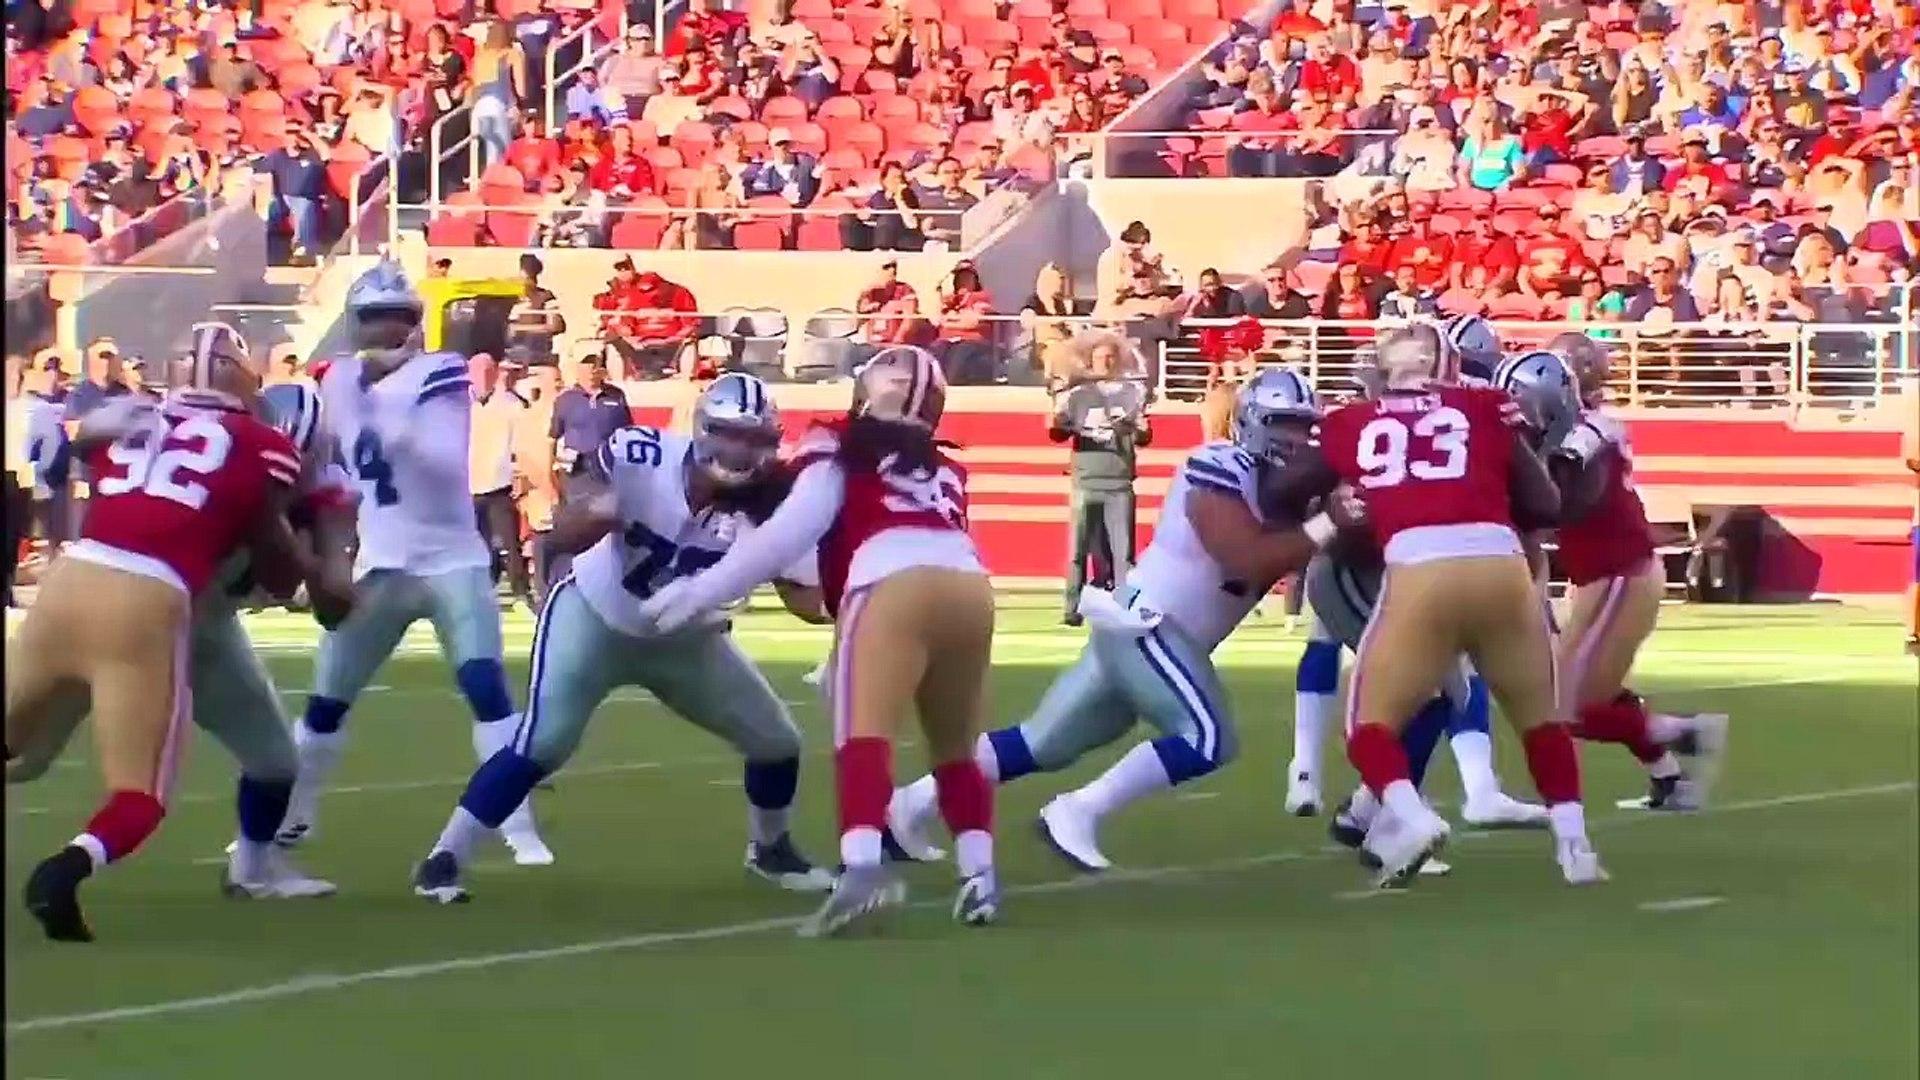 Cowboys vs 49ers NFL Preseason First Half Highlights _ NFL Highlights